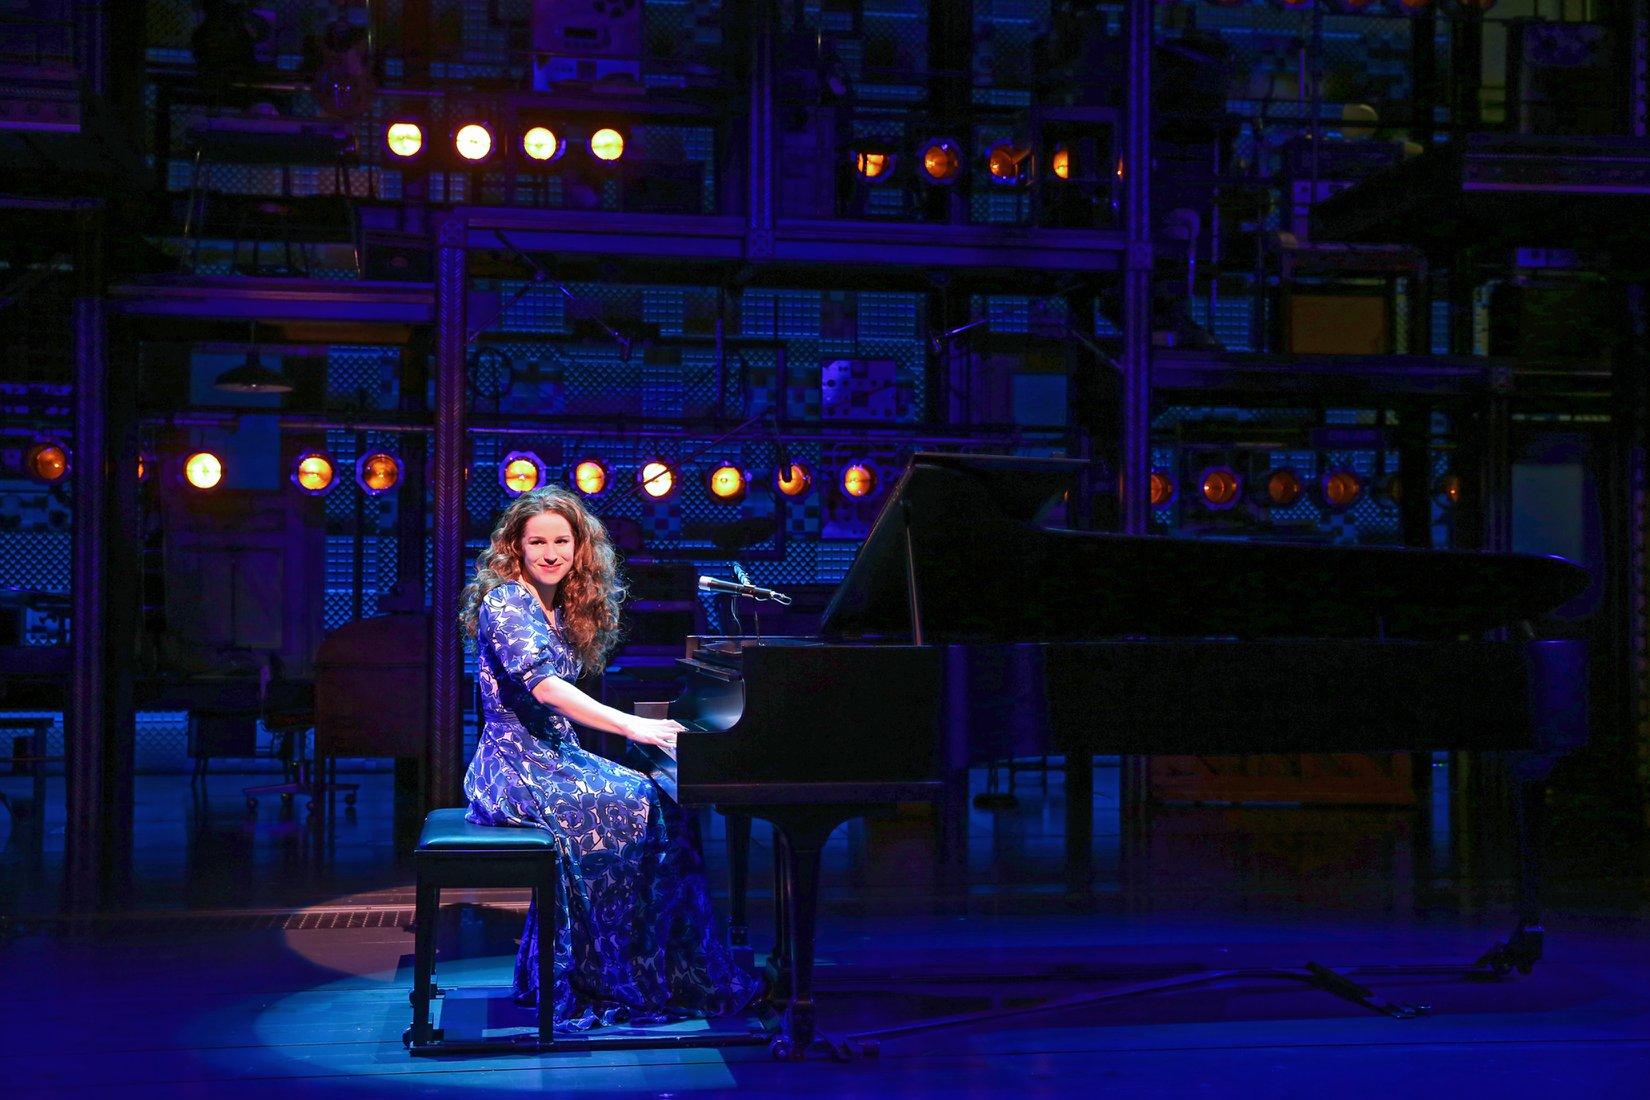 Carole King at the piano Broadway Cheap